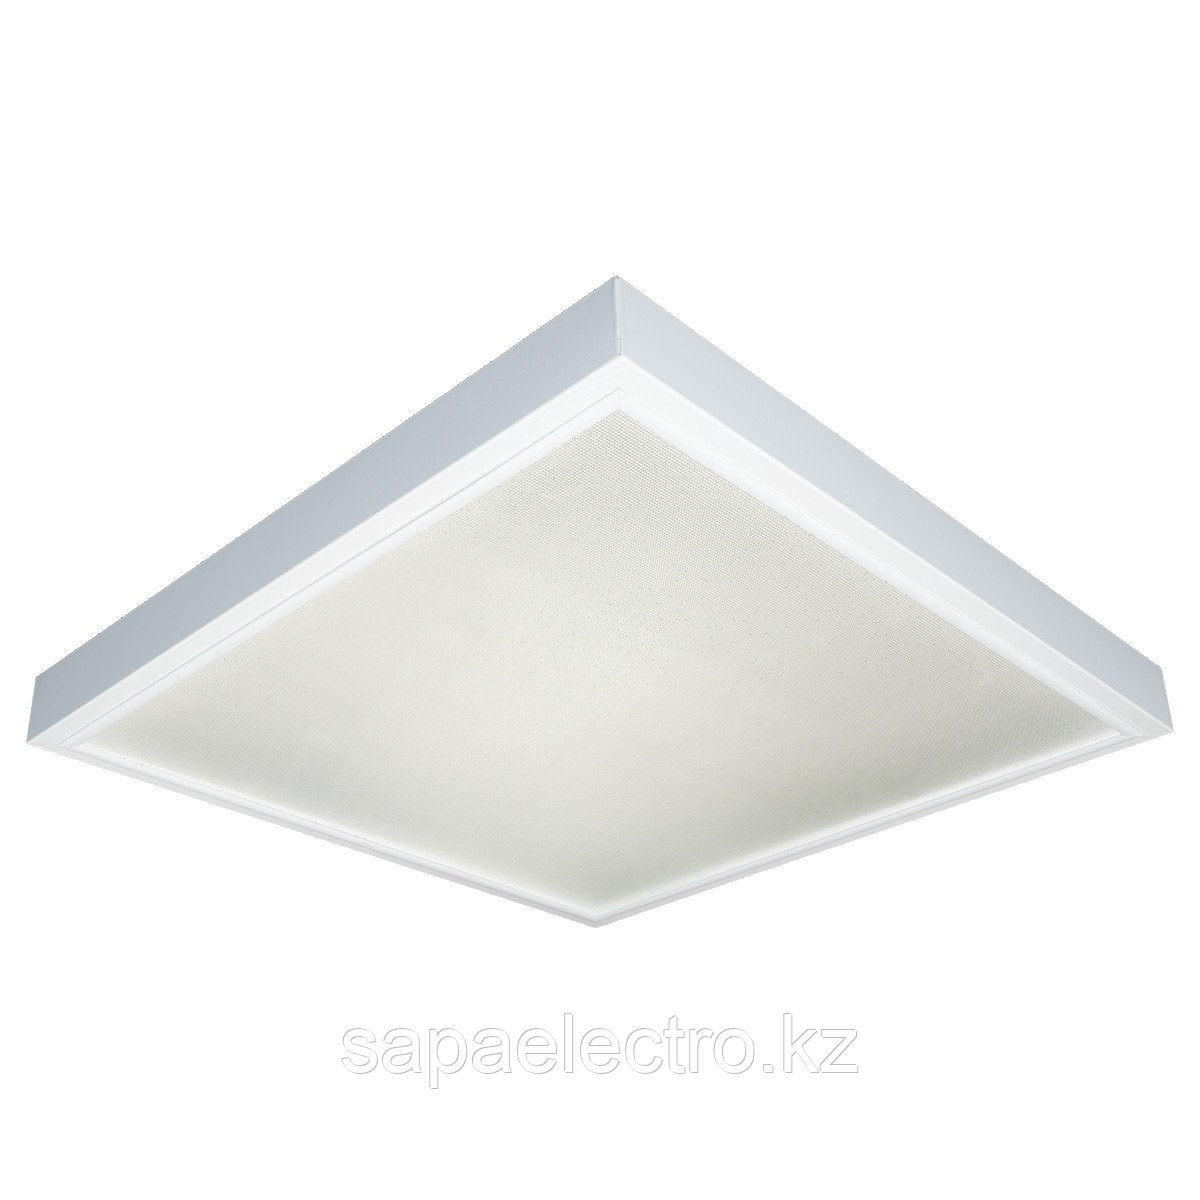 Св LEDTUBE 4x9W/ 60см PINSPOT MODERNA (с лампой) MG